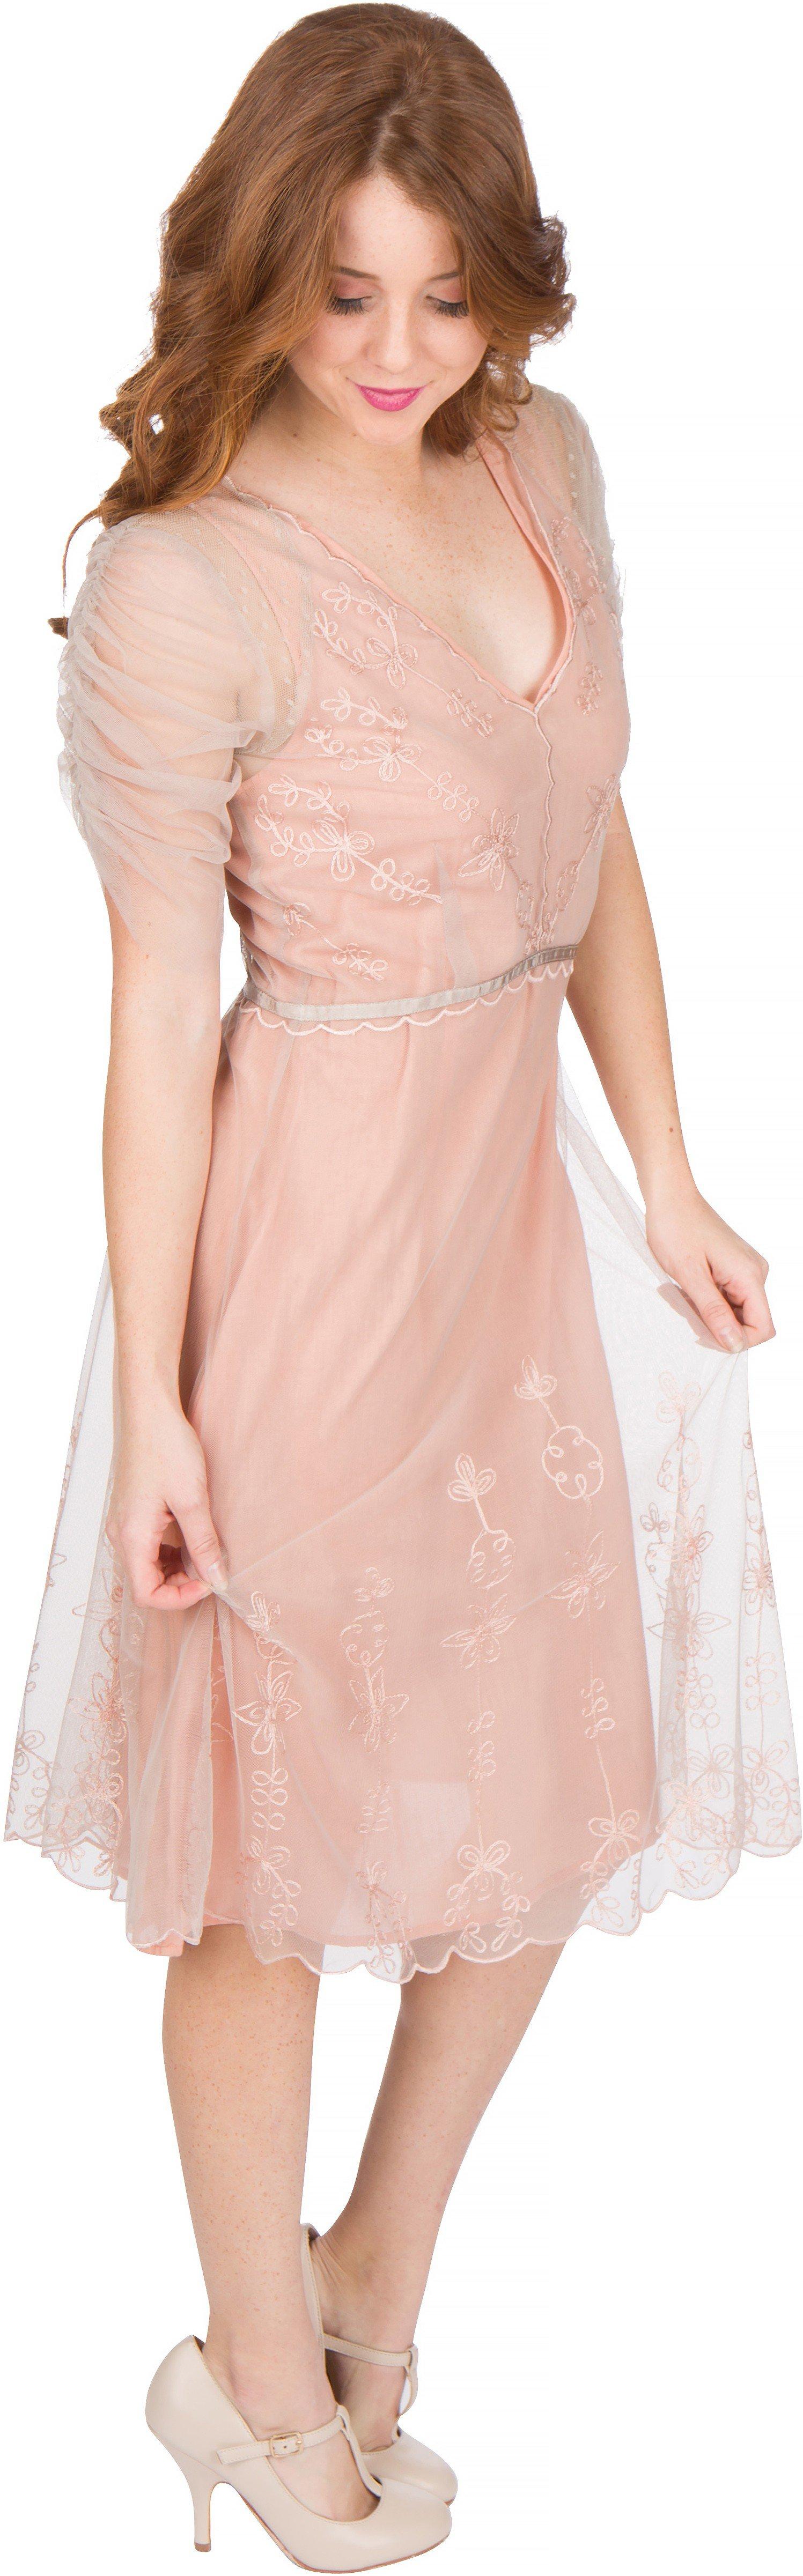 1920s Day Dresses, Tea Dresses, Mature Dresses with Sleeves | Kleider